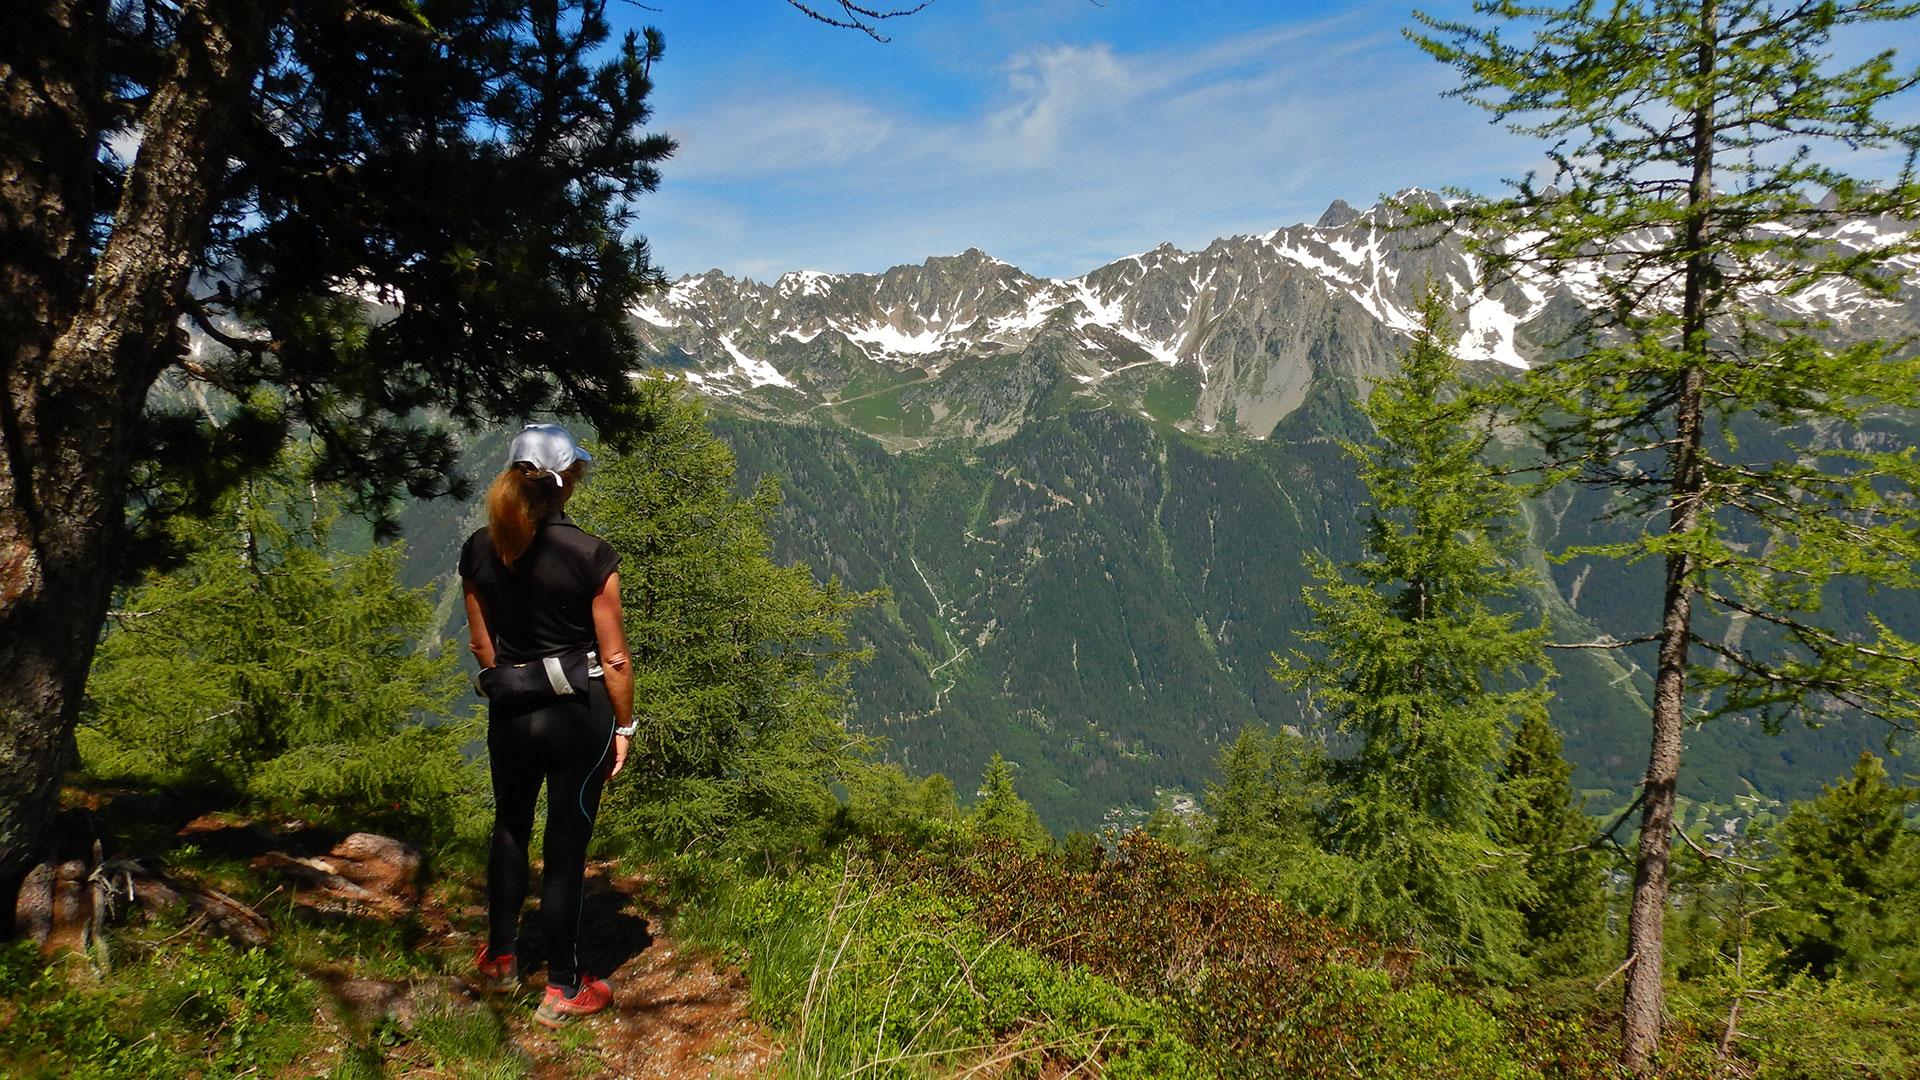 Chamonix-Mont-Blanc - Montenvers Mer de Glace